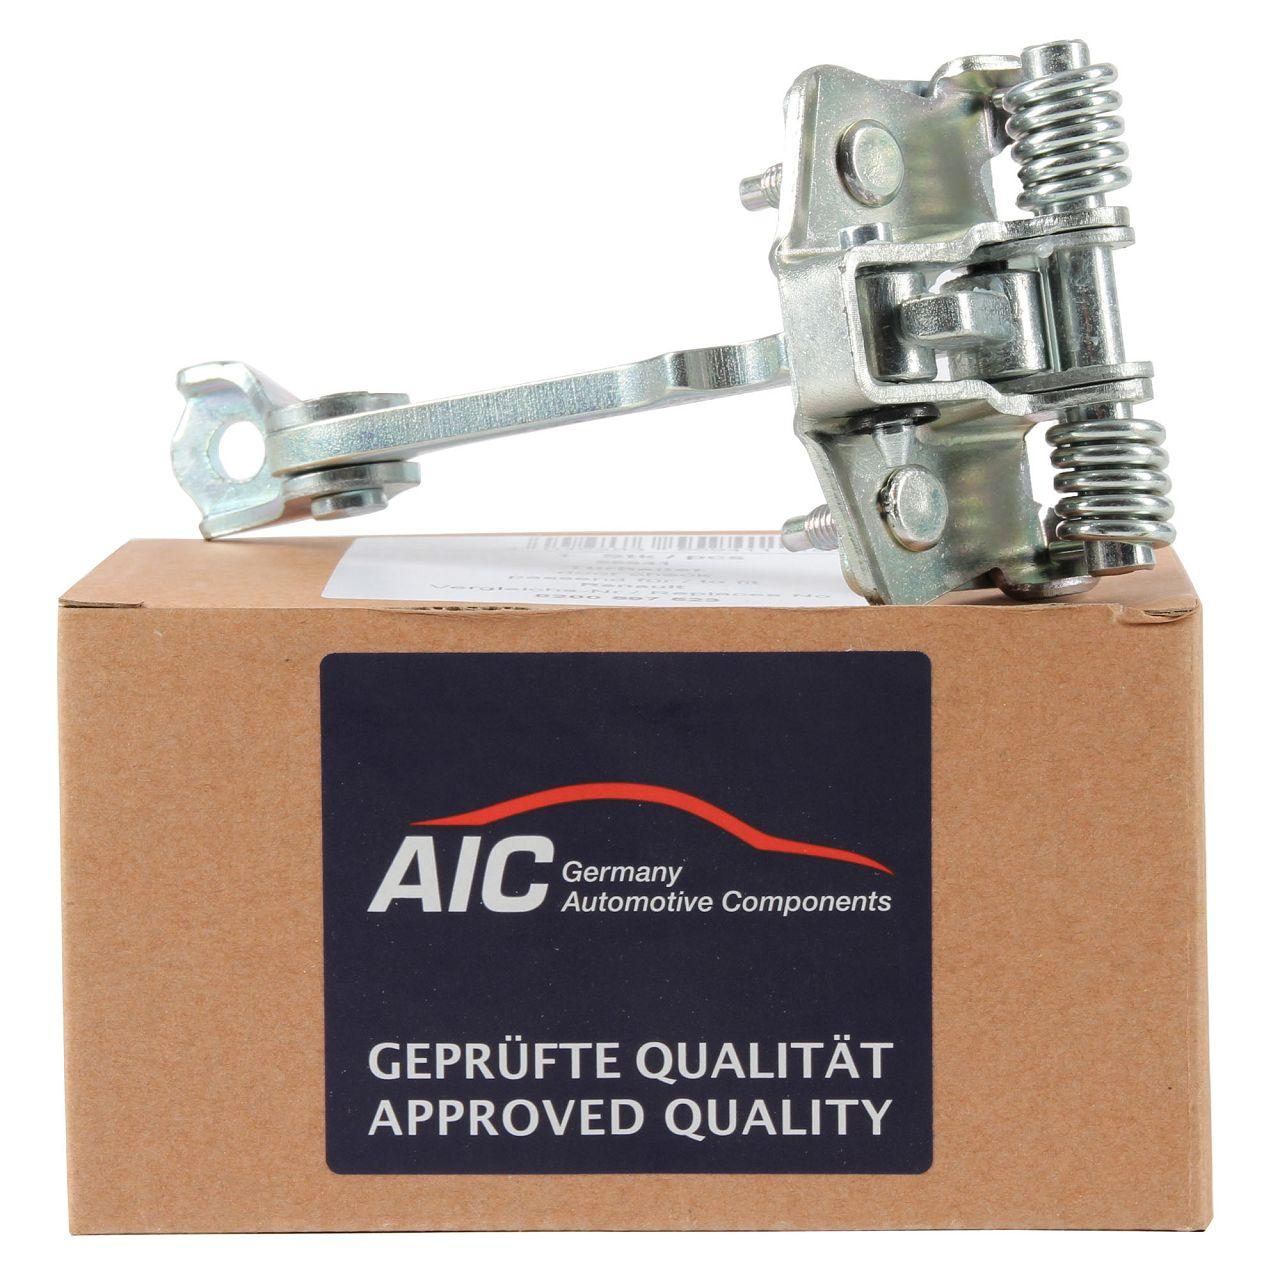 AIC Türfeststeller Türfangband IVECO Daily 3 OPEL Movano X70 RENAULT Master I II vorne